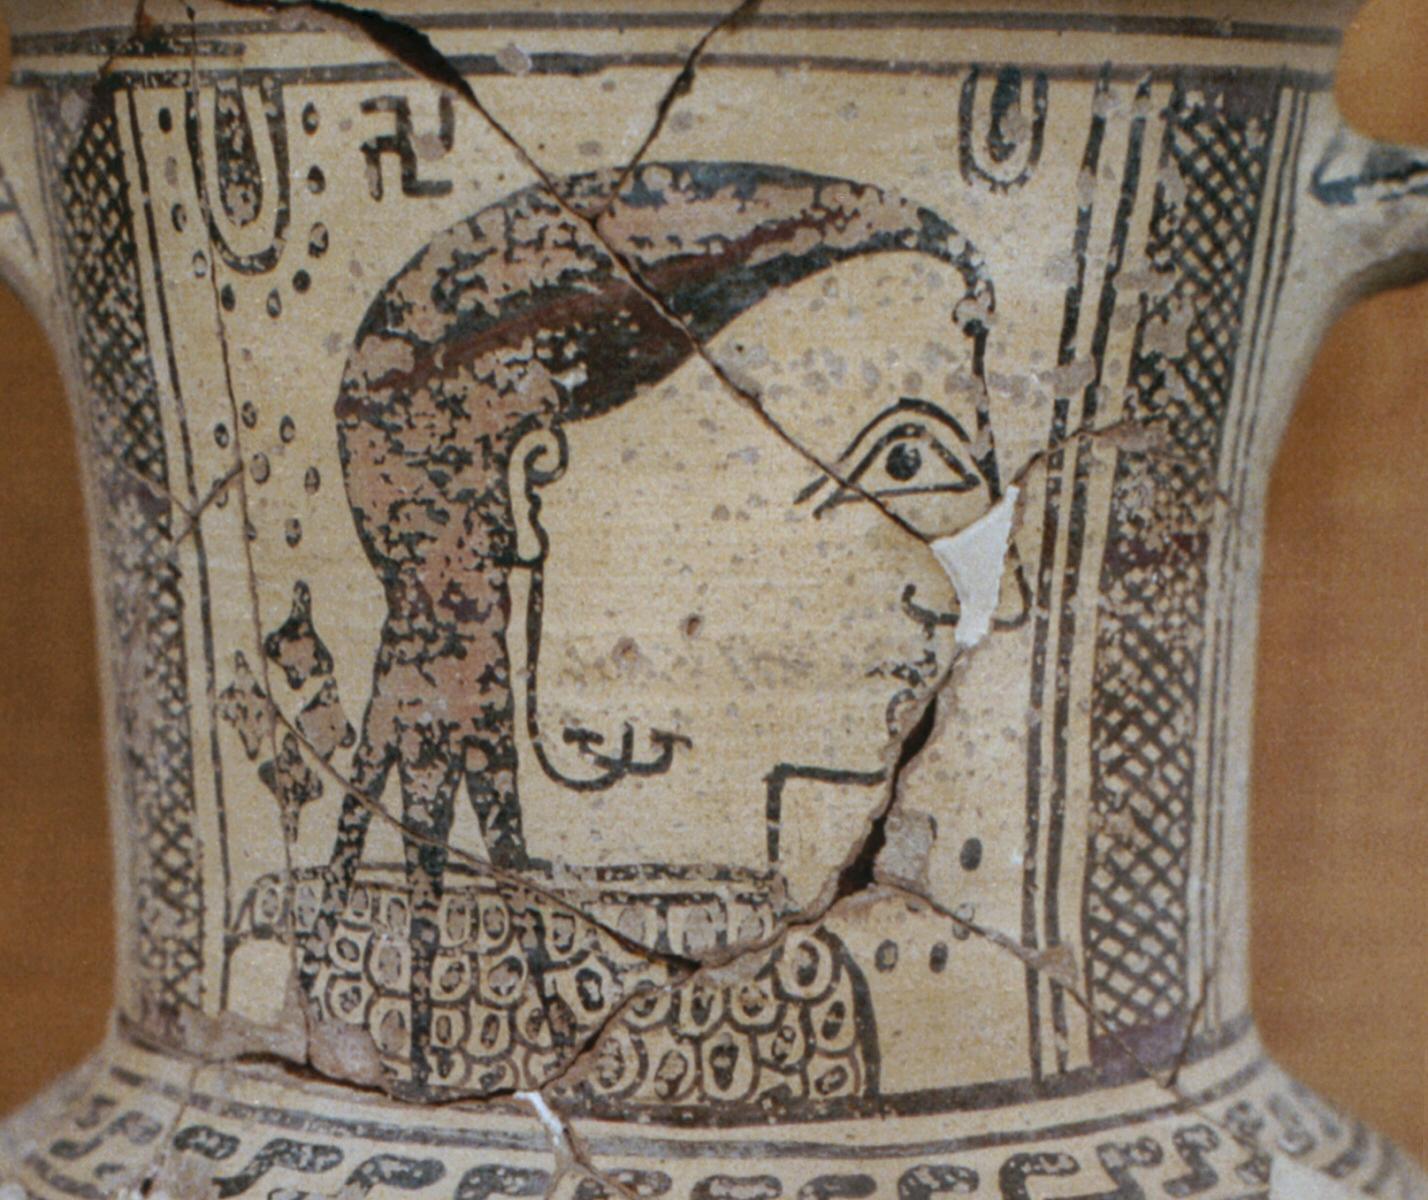 Ancient Vase with Swastika